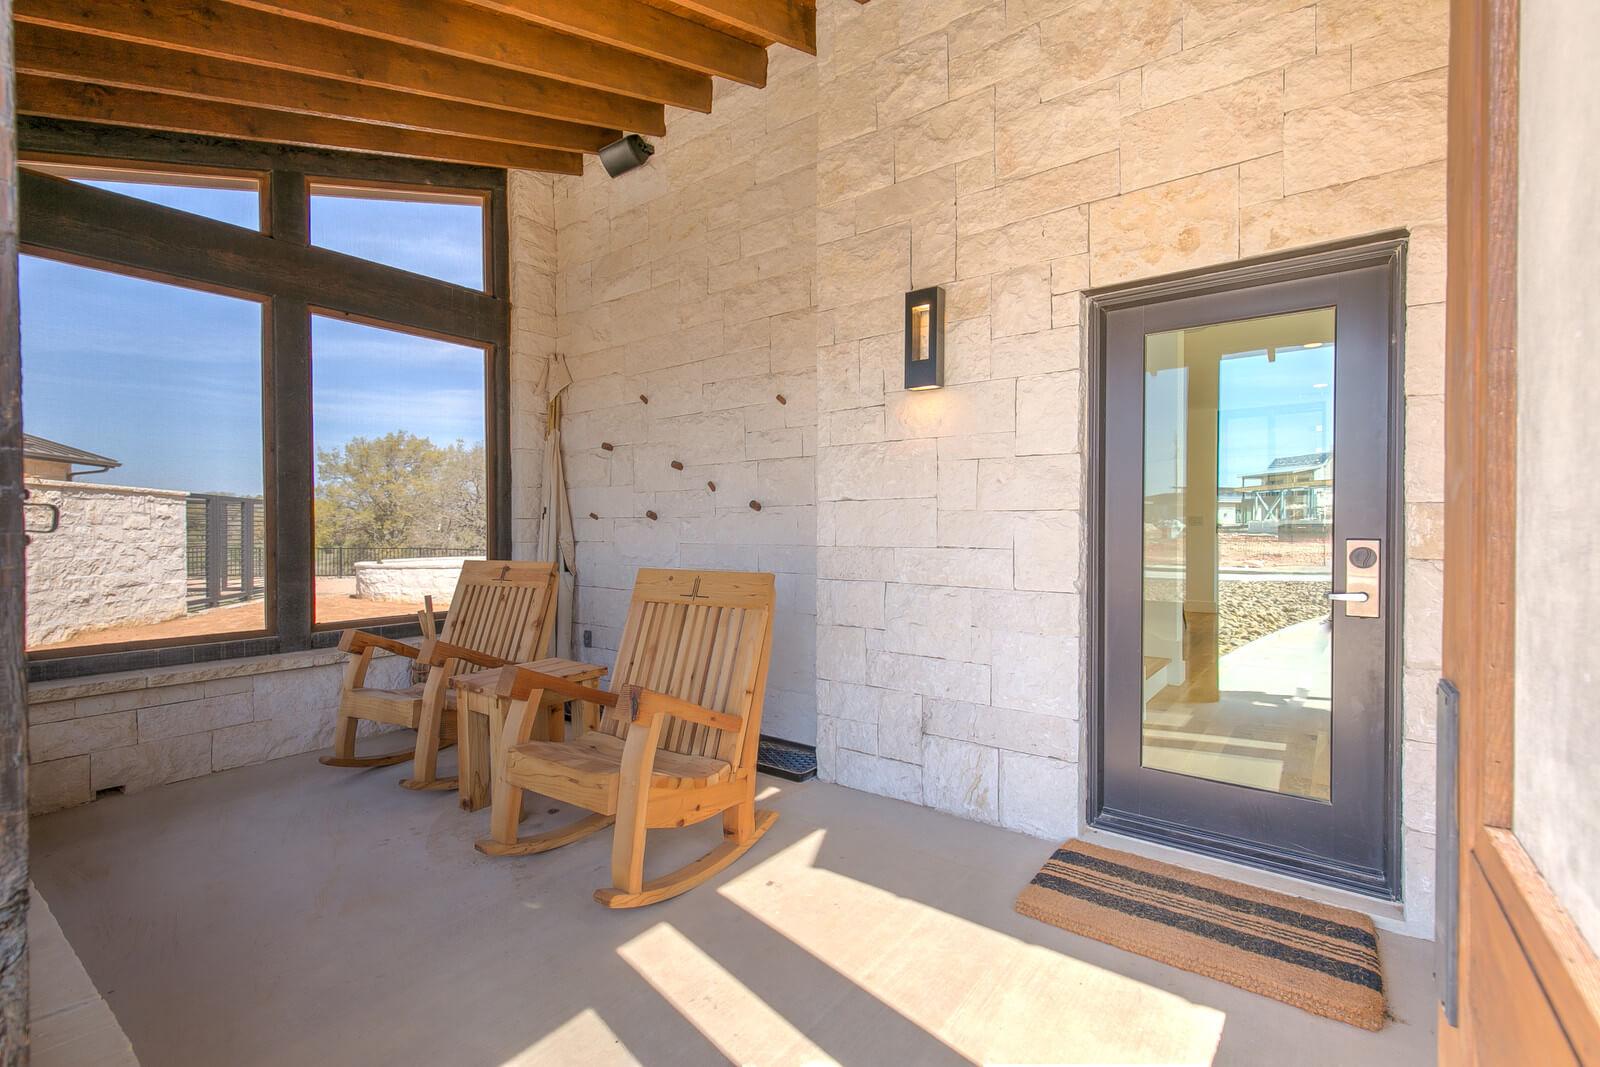 Steve-Bumpas-Custom-Homes-The-Residences-at-Rough-Creek-Lodge-Delta-45.jpg